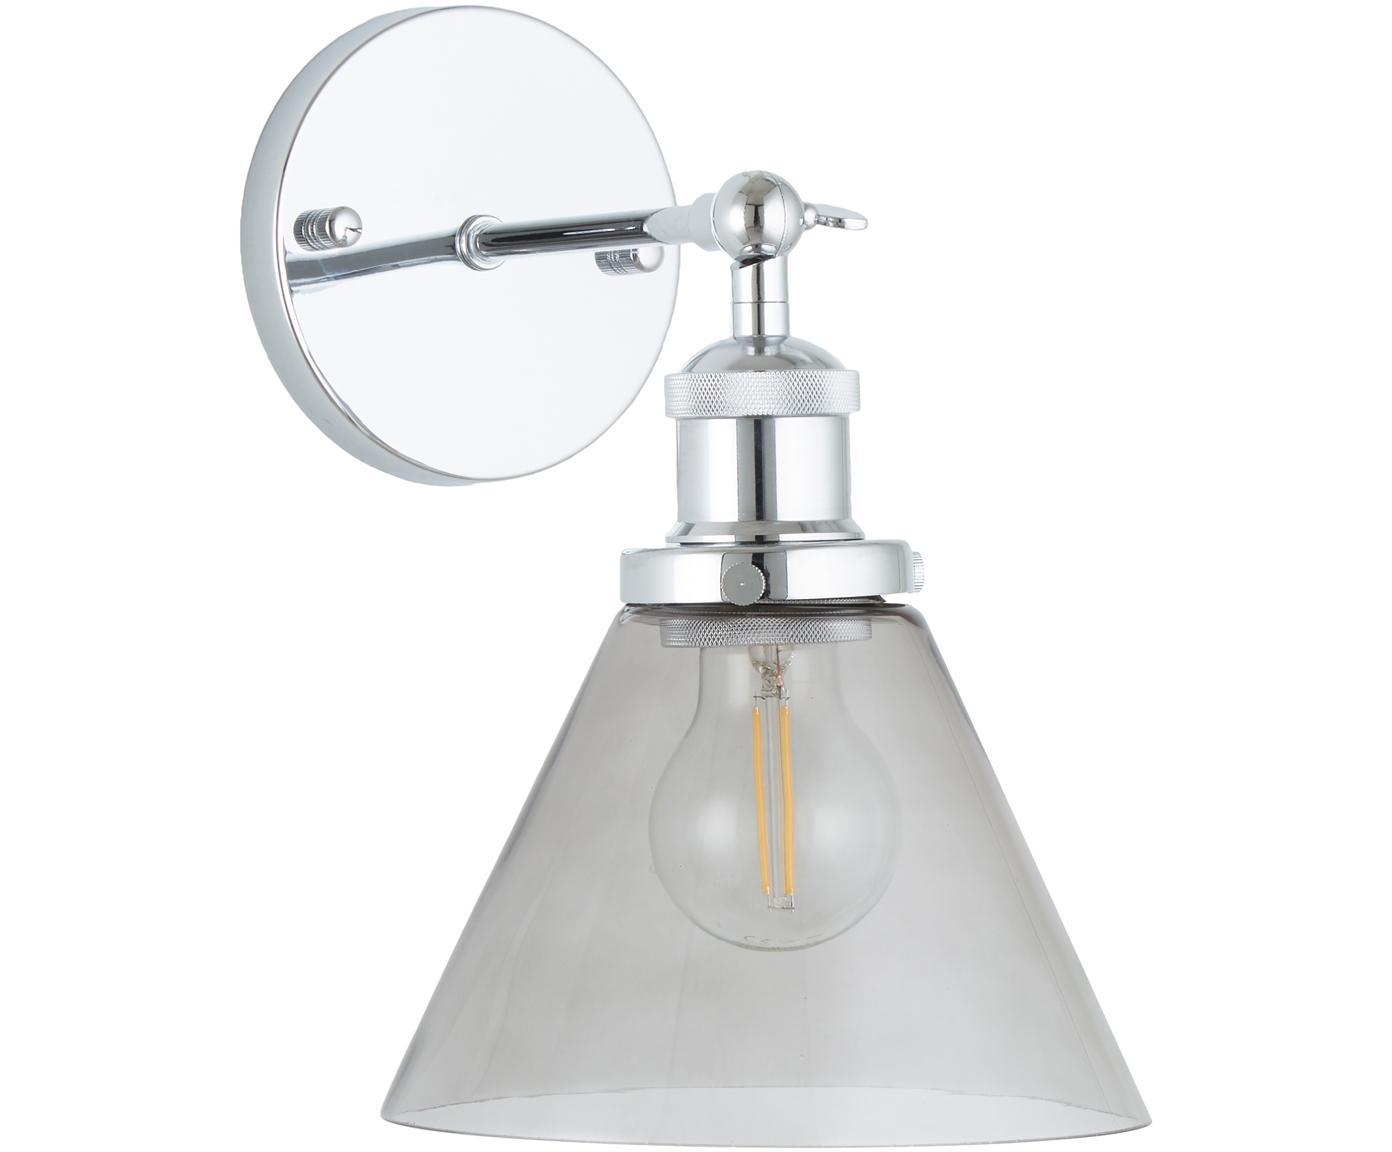 Wandleuchte New York Loft No.1, Lampenschirm: Glas, Grau, Chrom, 19 x 29 cm